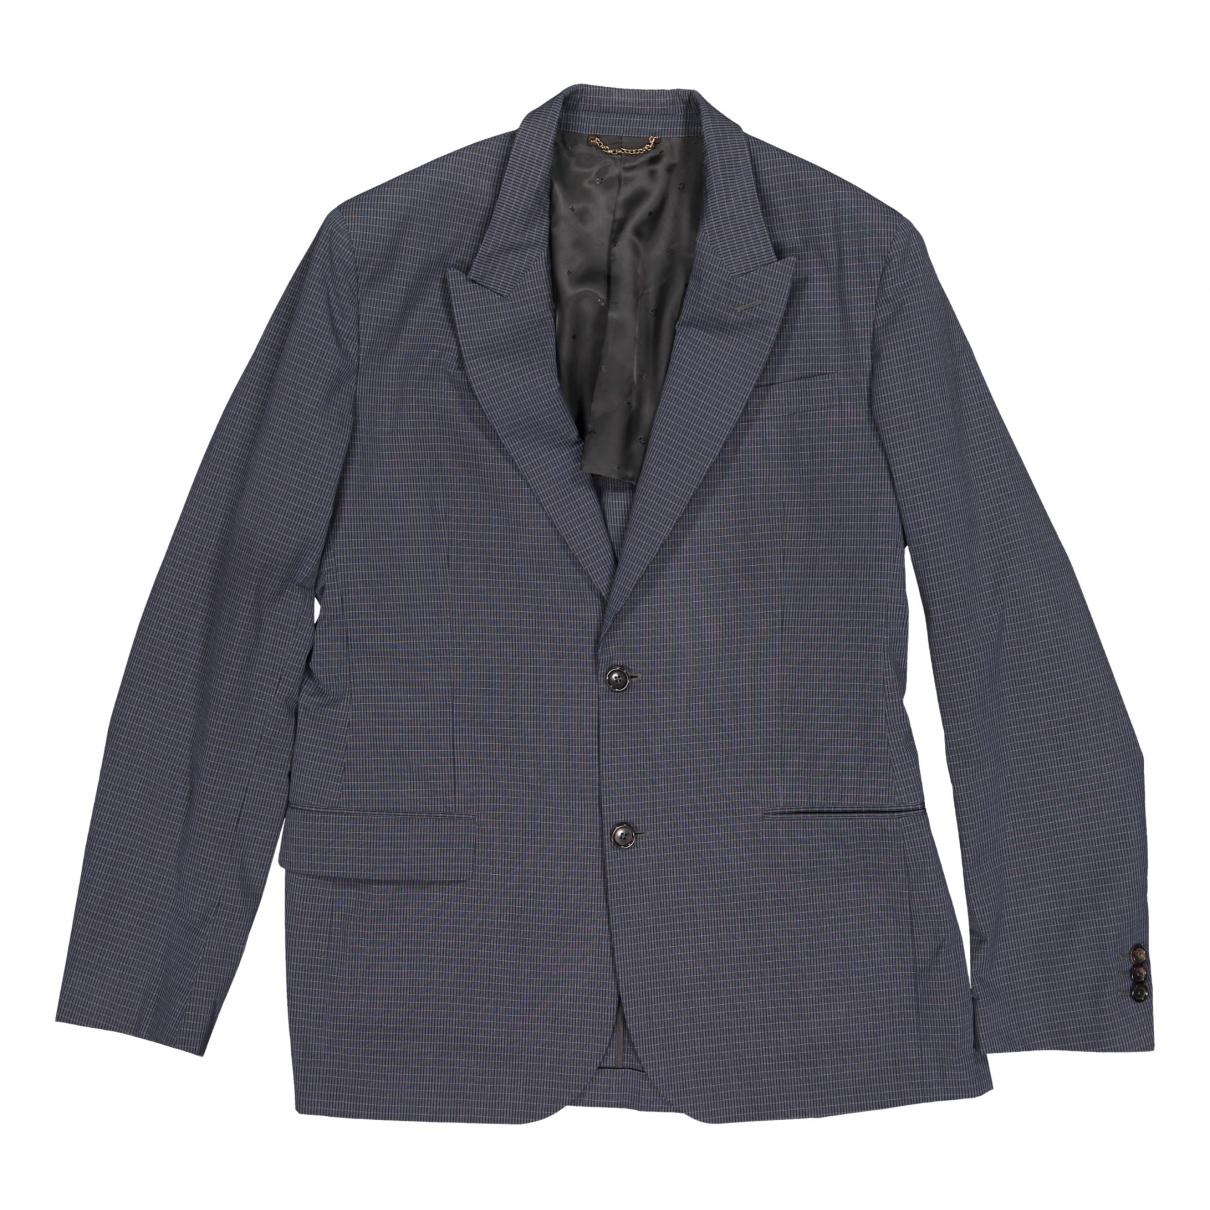 Louis Vuitton \N Jacke in  Marine Baumwolle